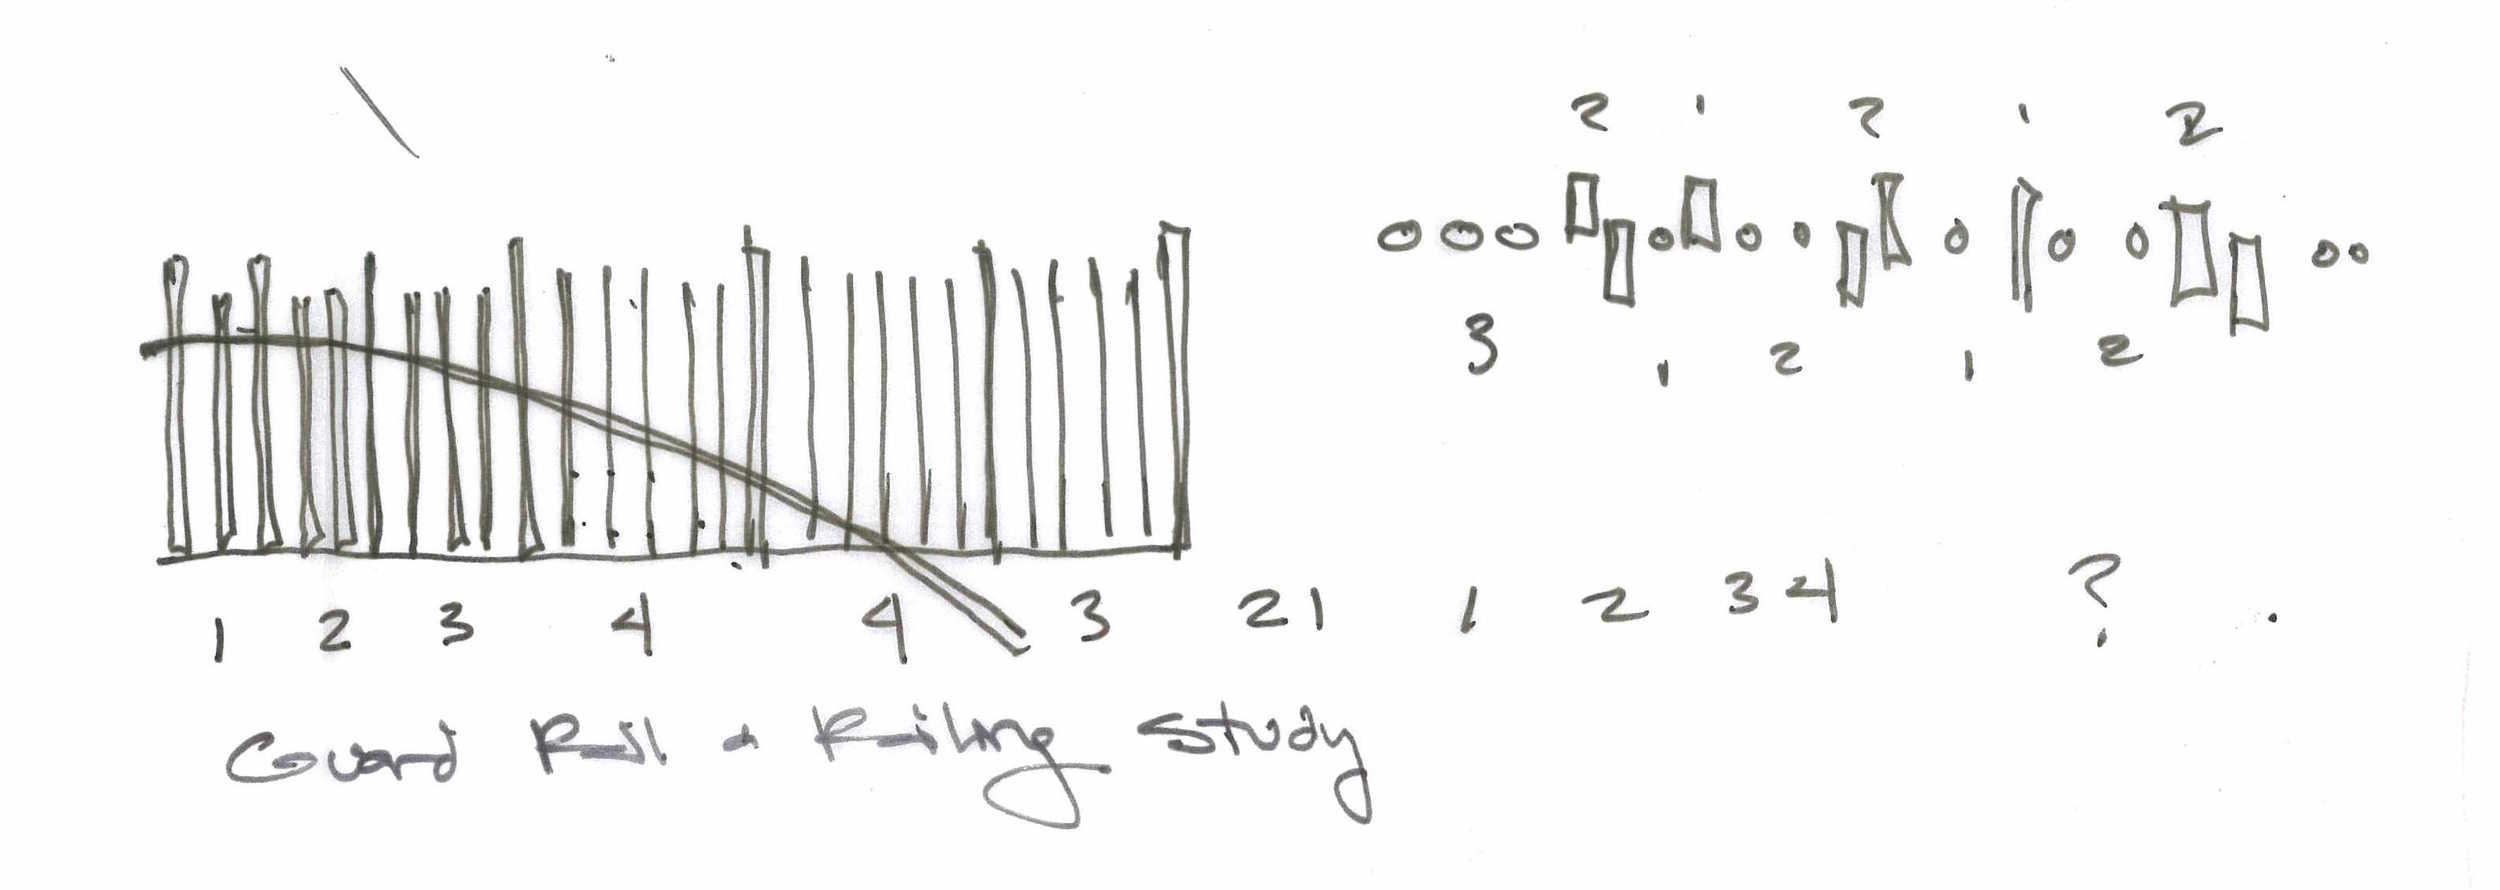 fd9b9-linegeometry.jpg